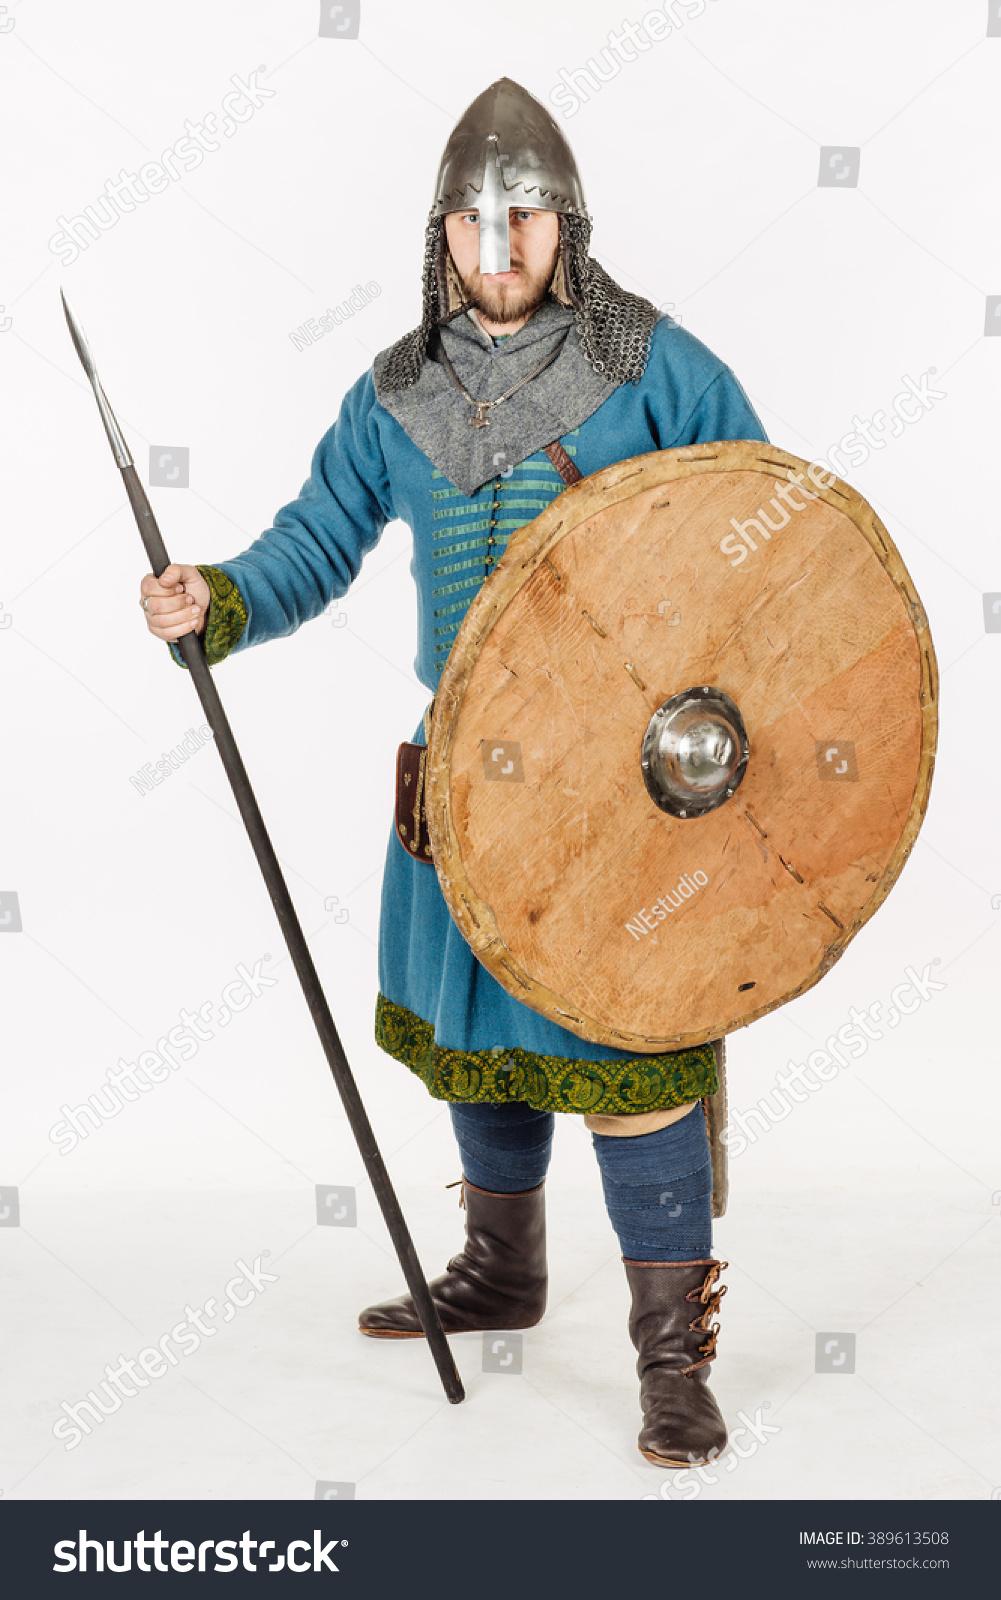 Medieval slavic soldier looking at… Stock Photo 389613508 - Avopix com